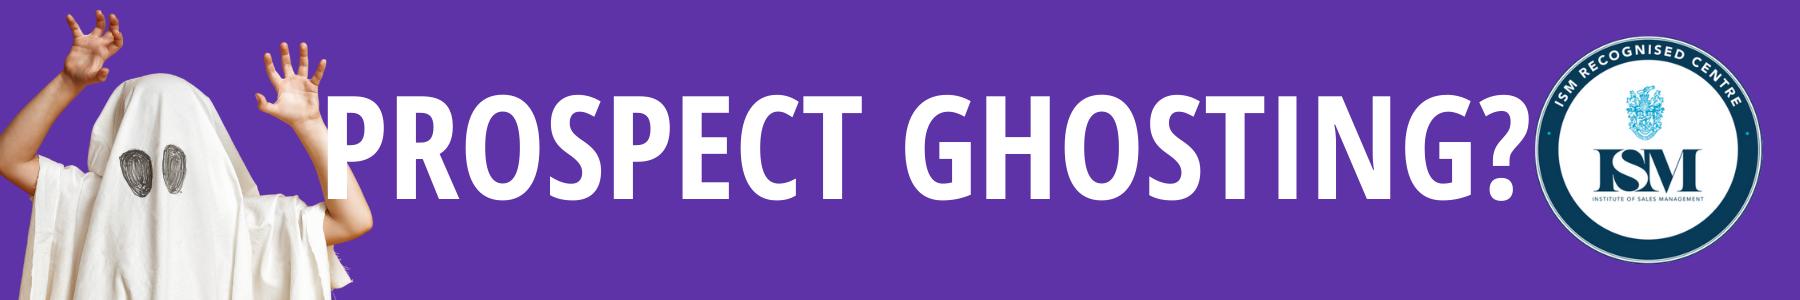 prospect ghosting